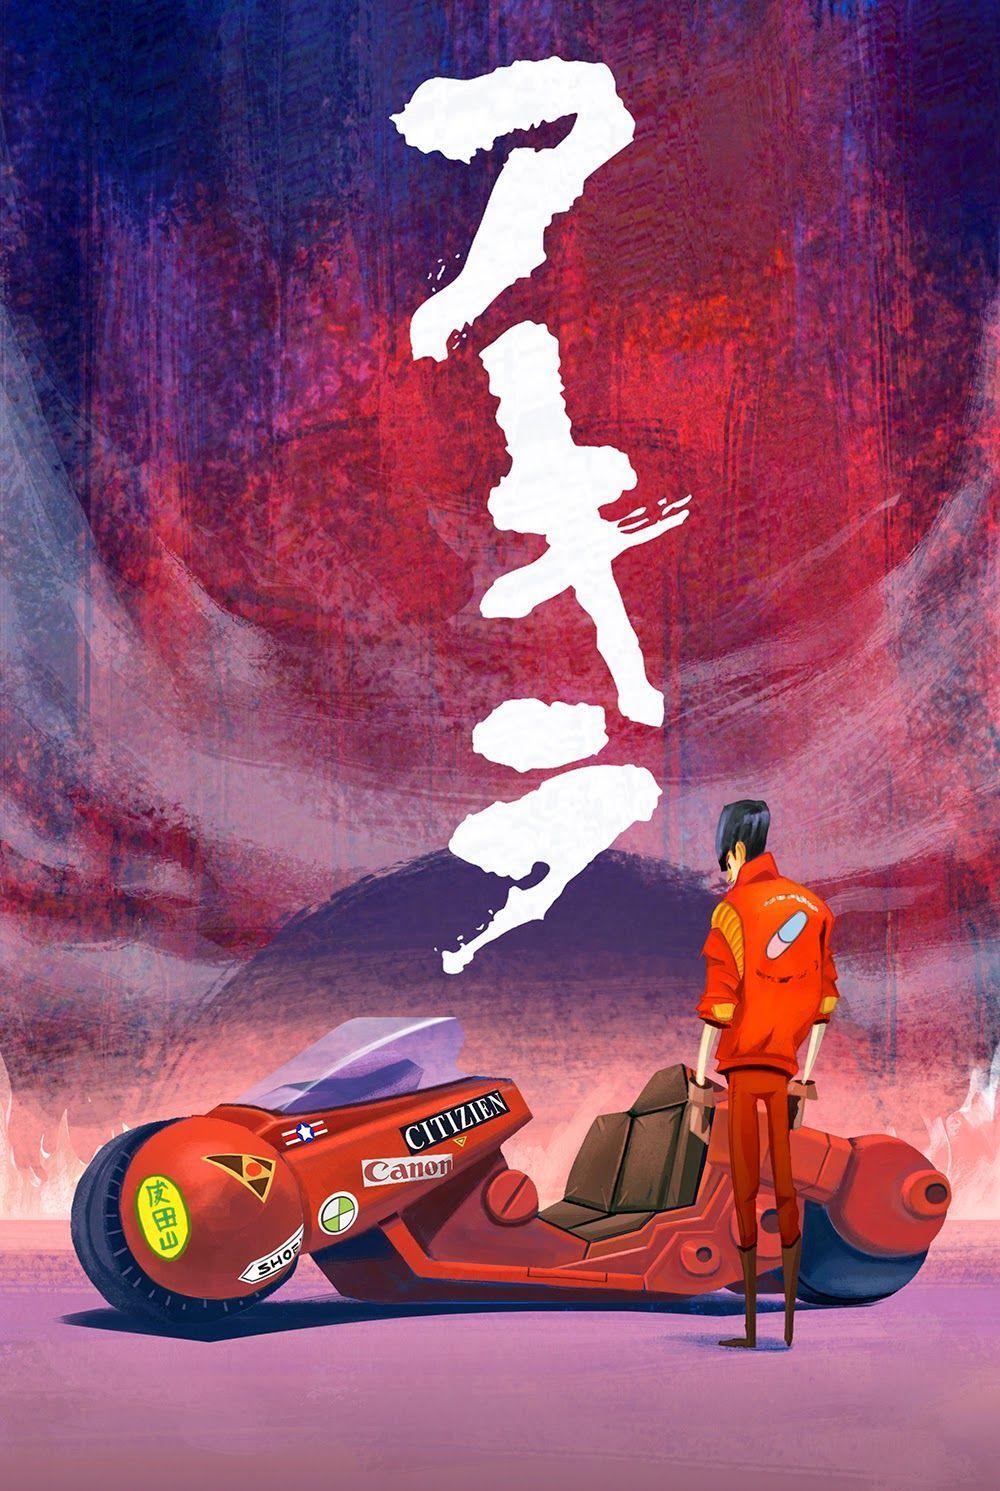 Pin By Geek Boards On Akira Anime In 2020 Akira Anime Akira Science Fact